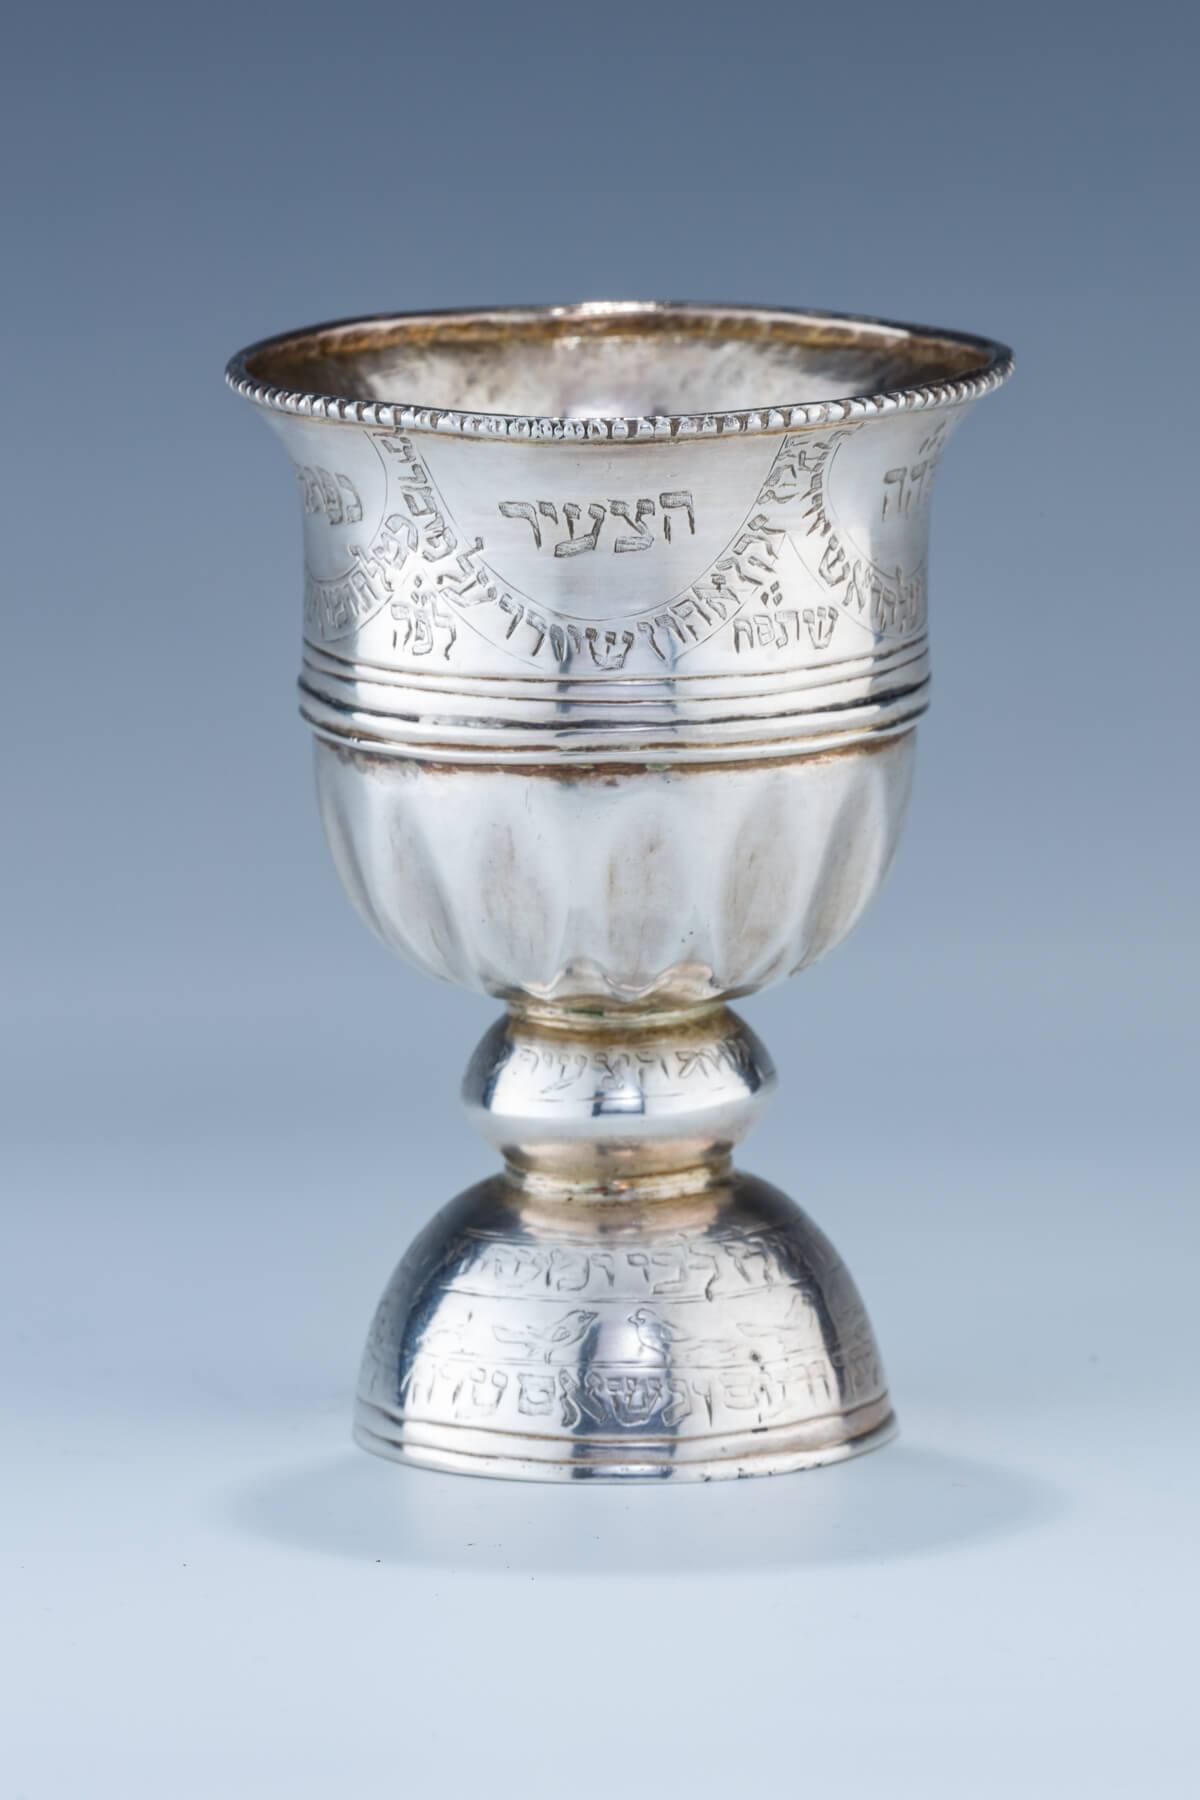 67. A Rare Silver Kiddush Cup